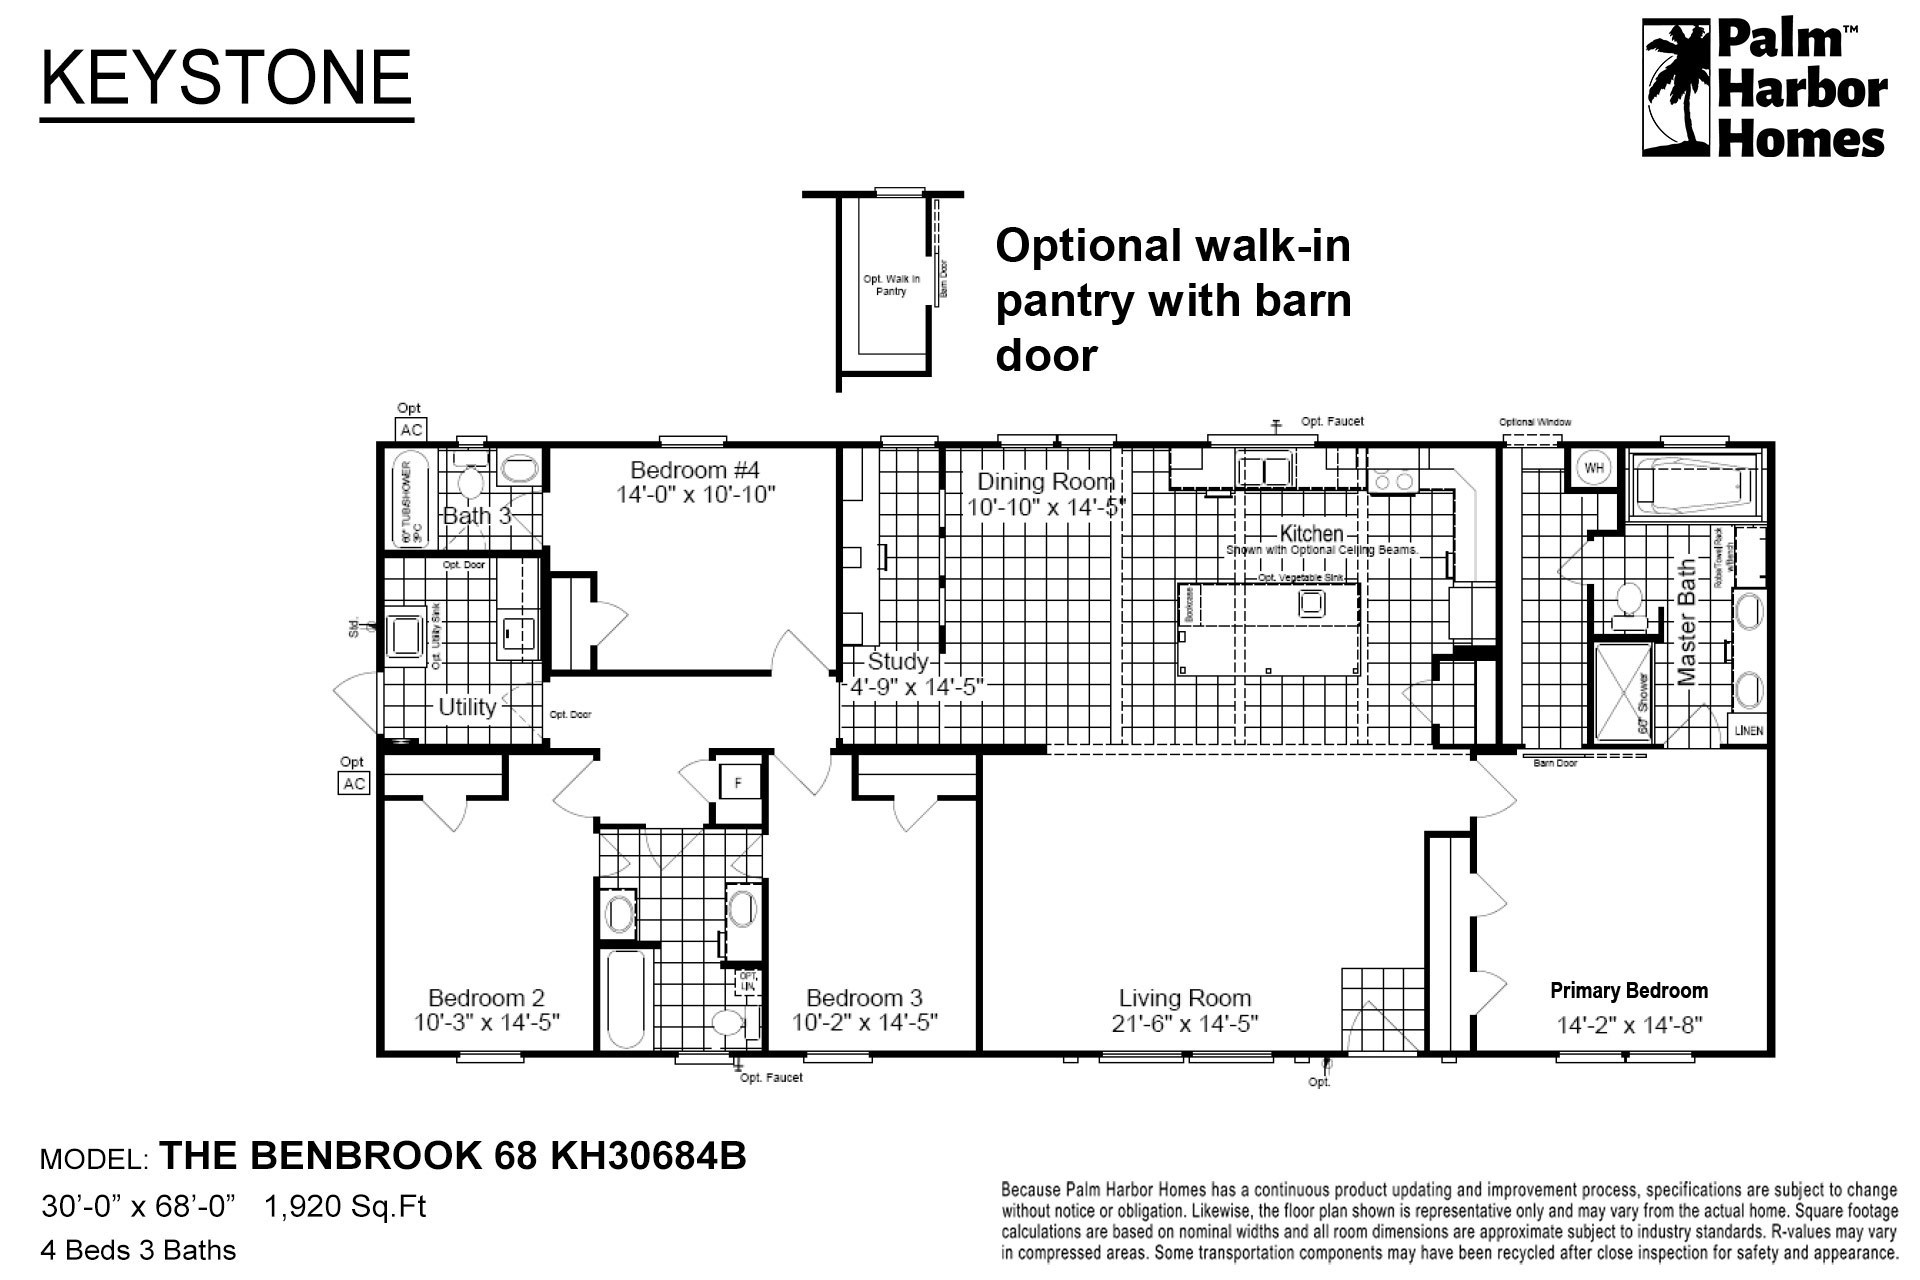 Keystone - The Benbrook 68 KH30684B